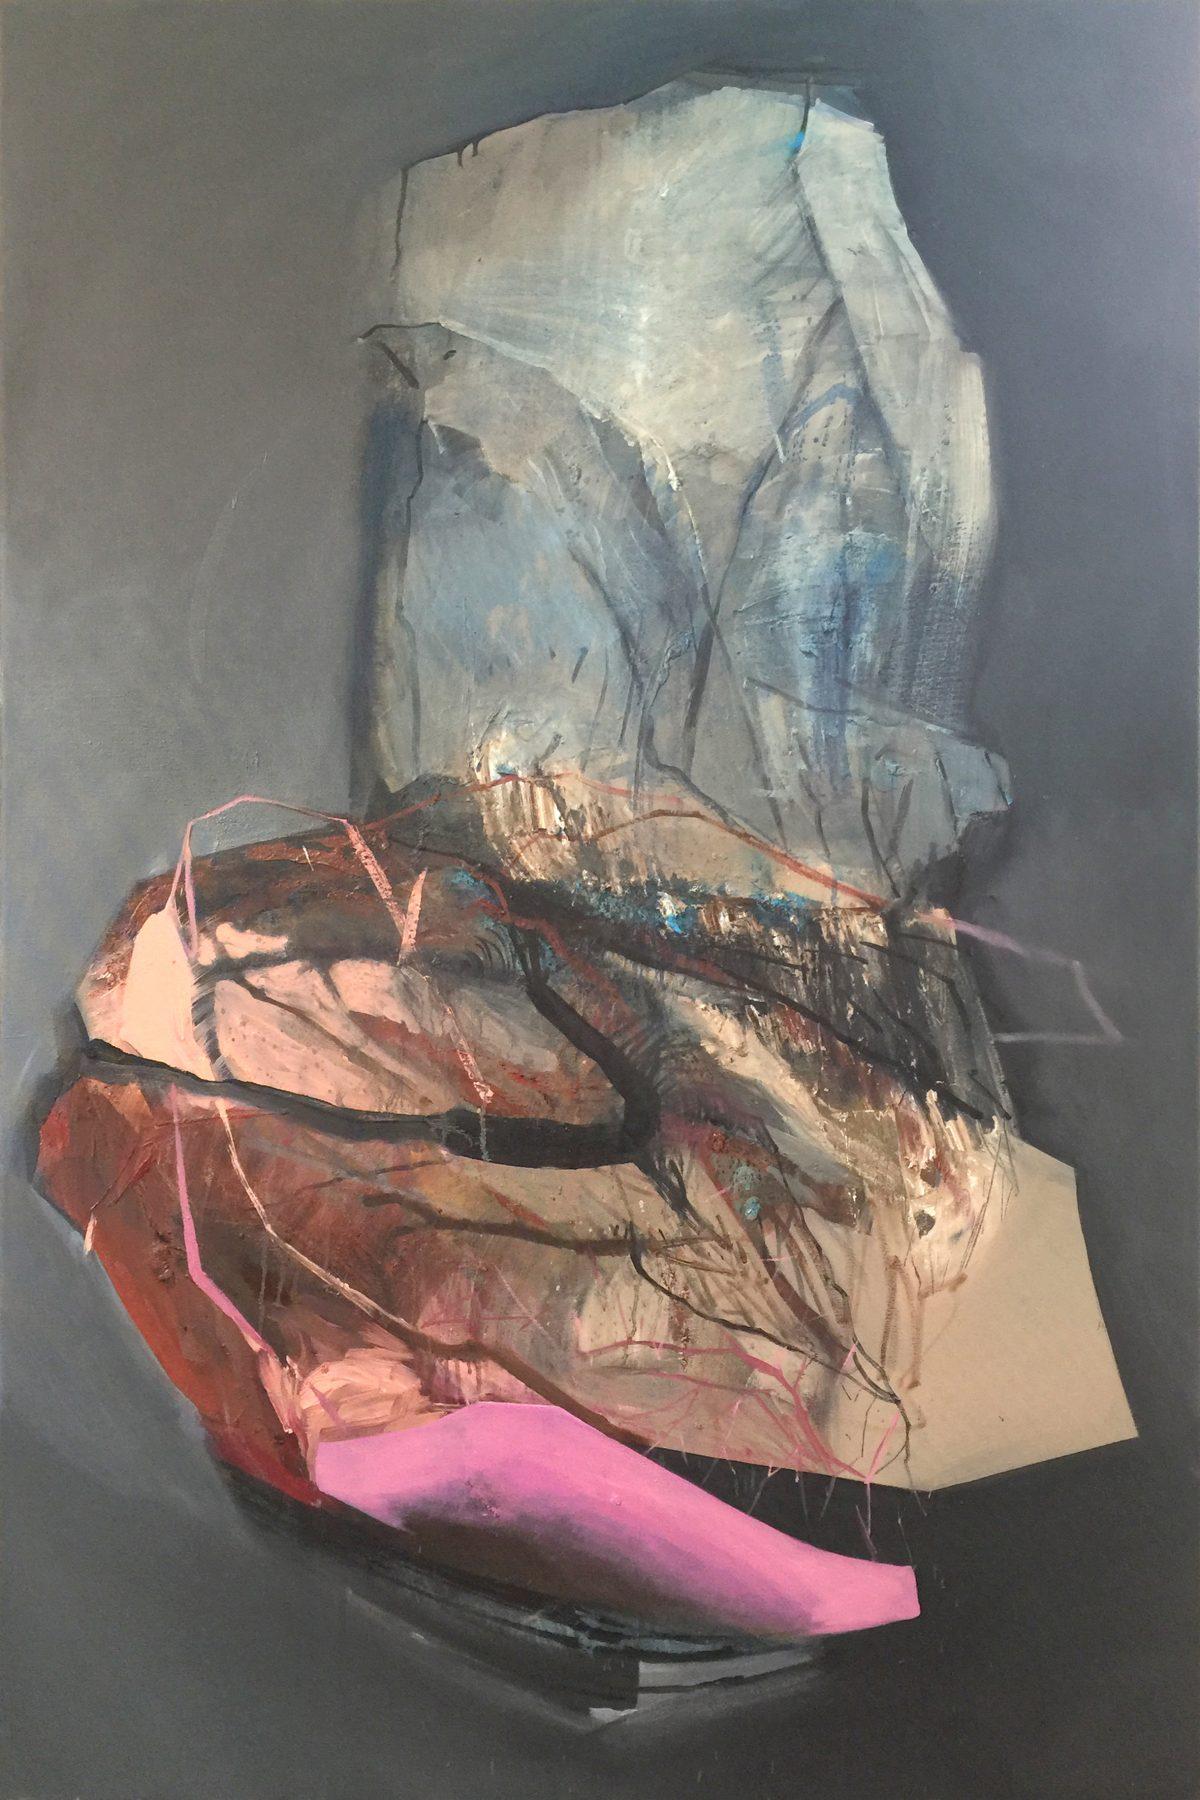 Fragments 2, acrylic and oil on canvas, 2019, 100x150 cm